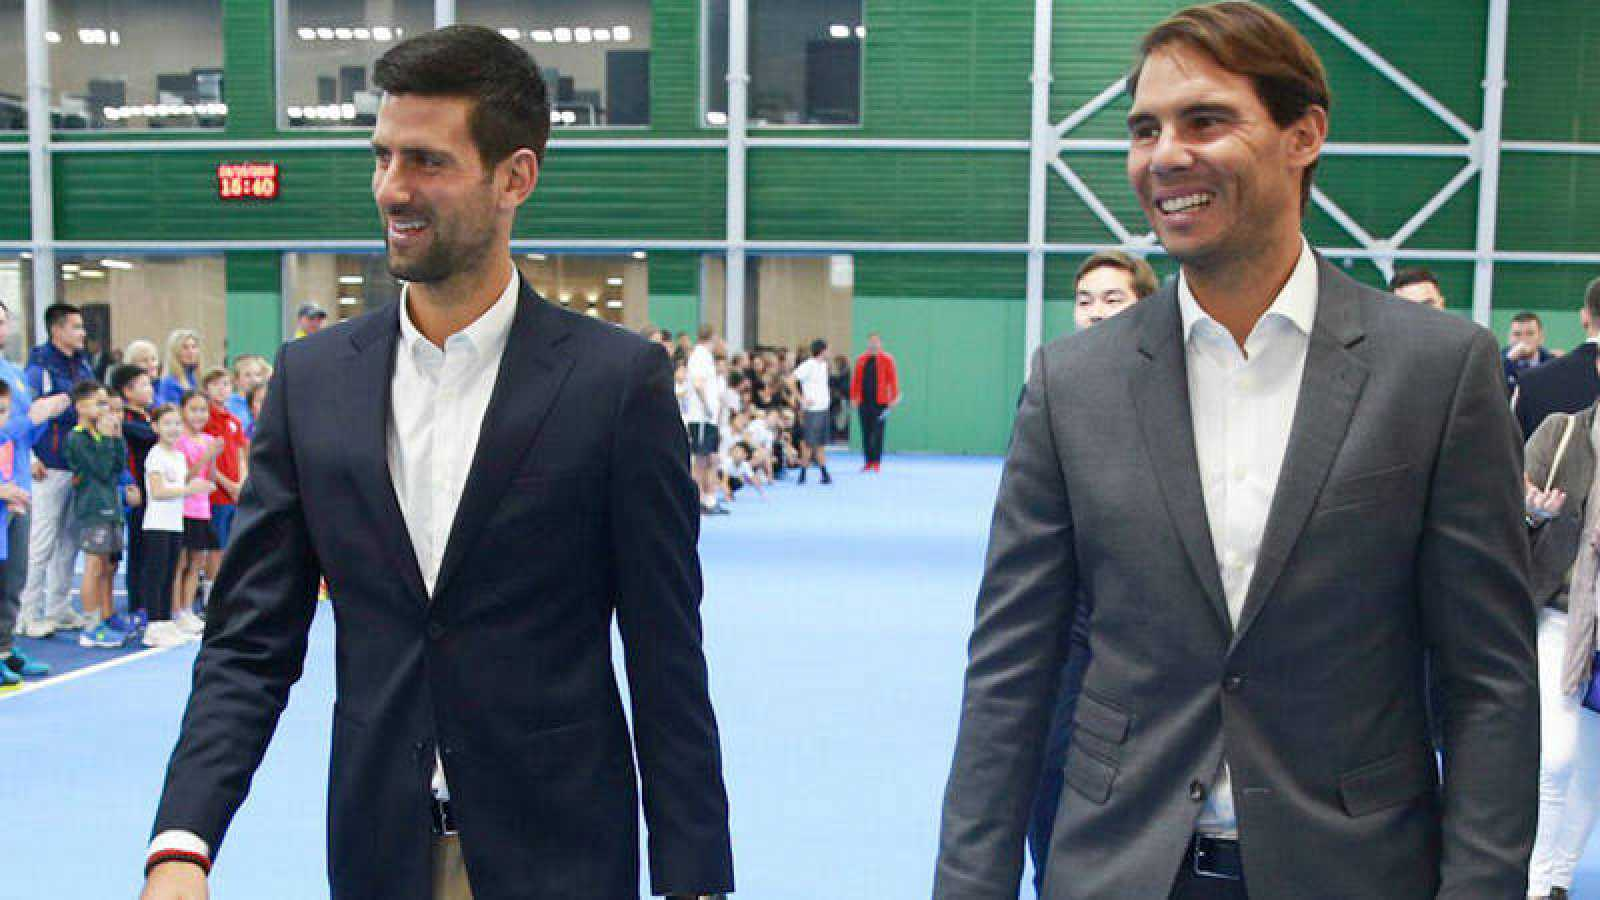 Novak Djokovic (i) y Rafa Nadal (d) en un acto benéfico en Kazajistán previo a la Davis.